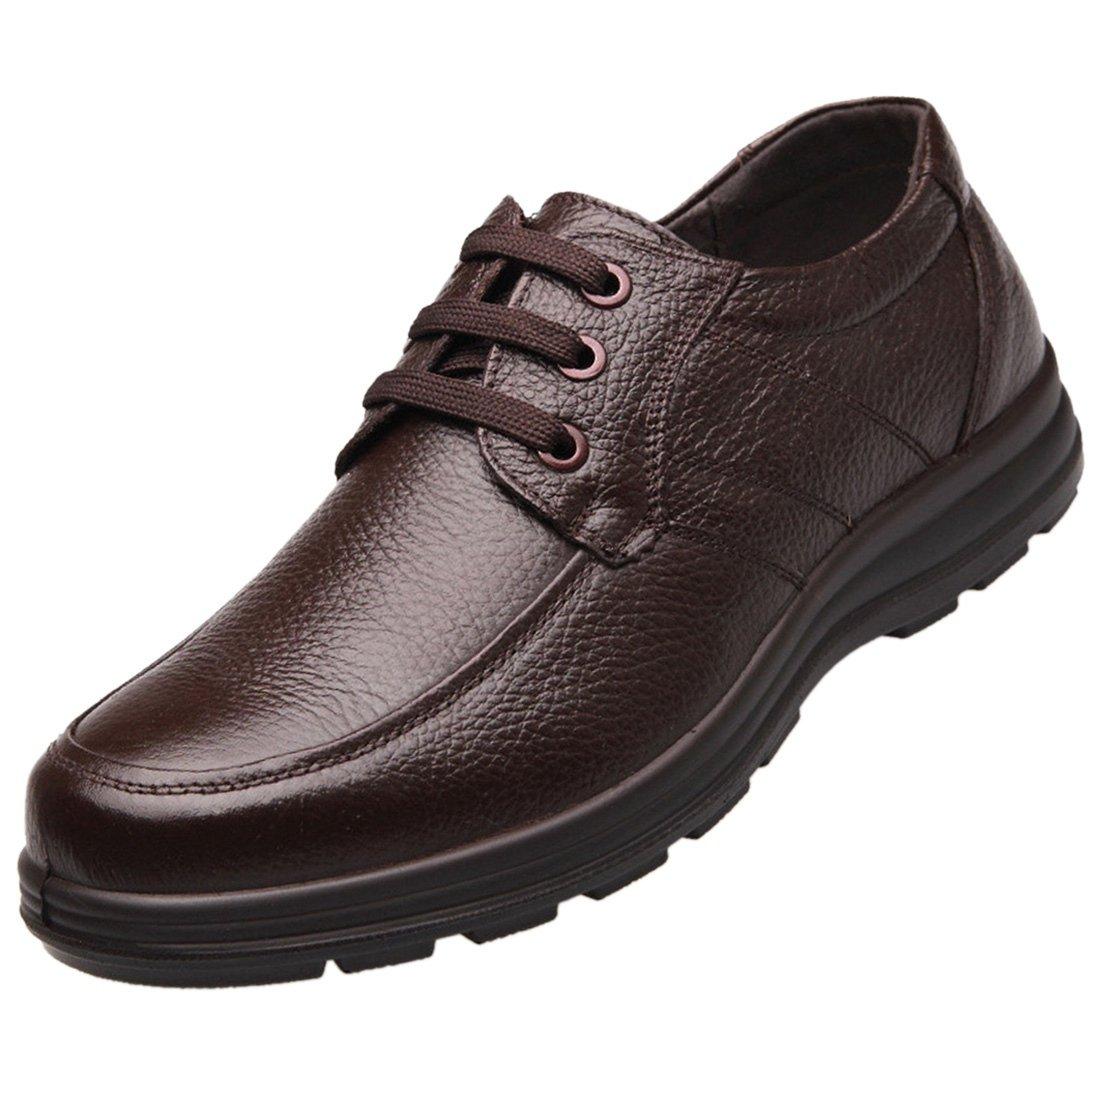 Enerhu Men Lace-up Chef Shoe Leather Flat Work Shoe Nonslip Oil Resistant Waterproof